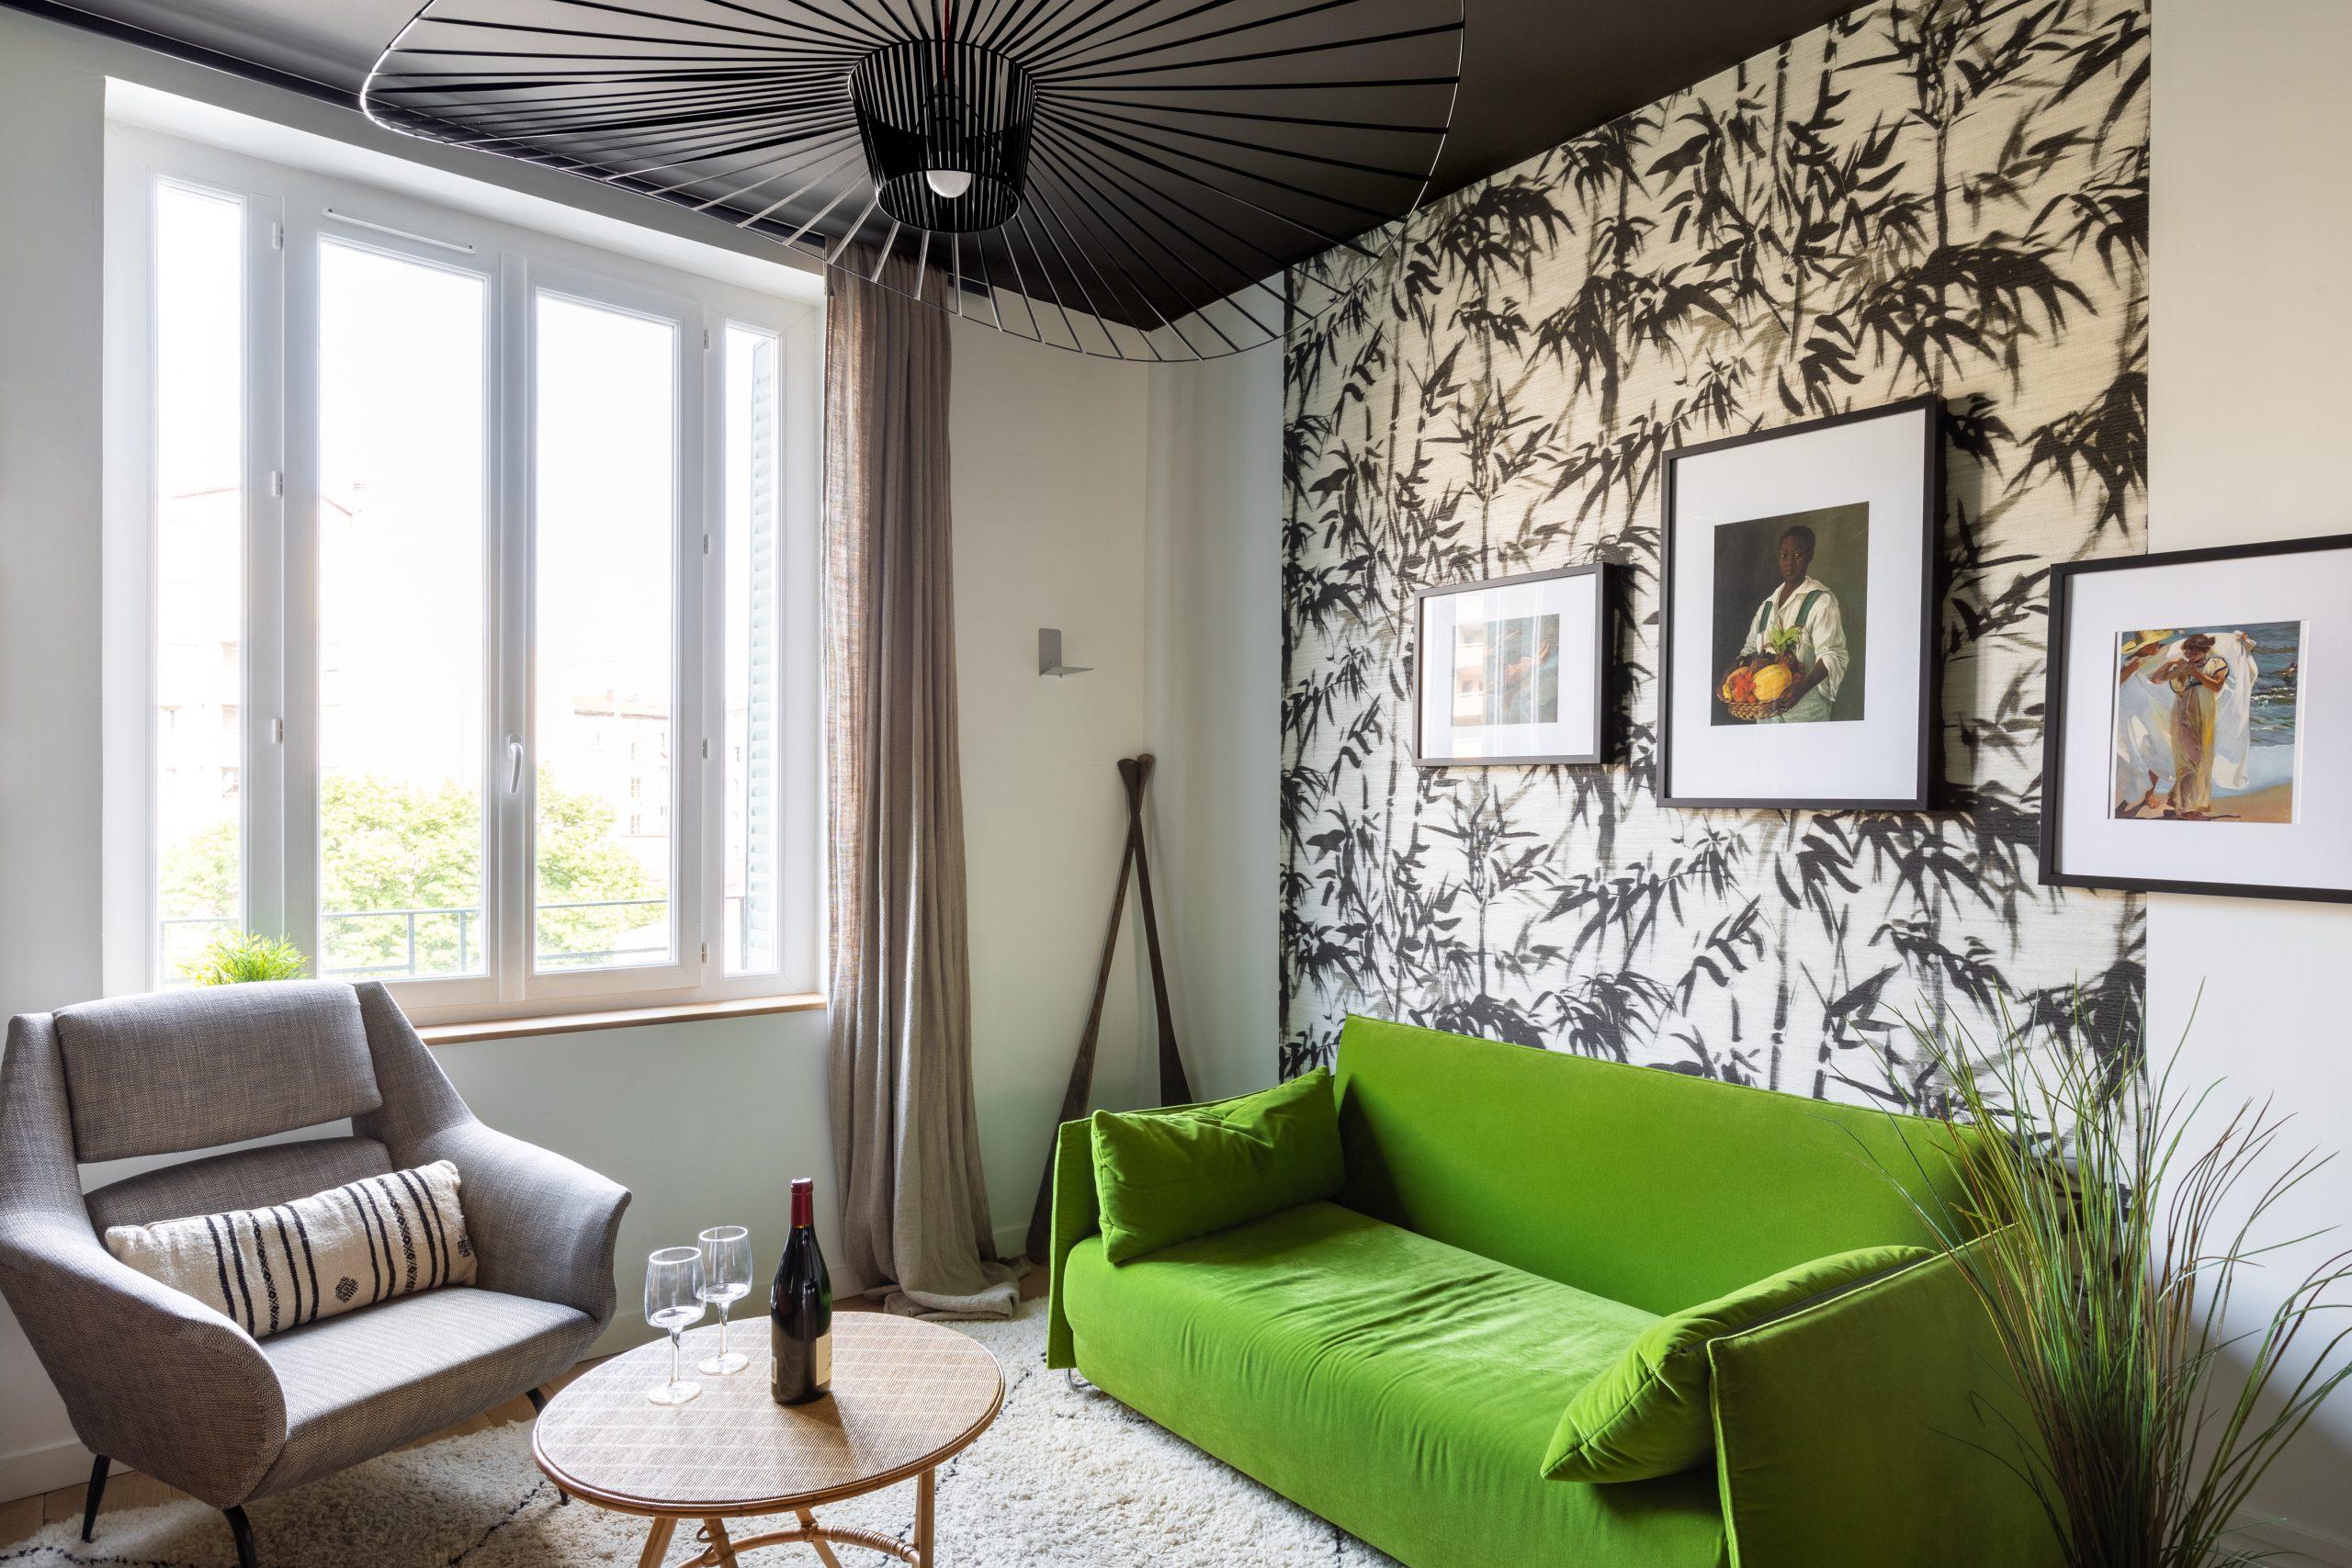 Pocessus de vente immobilier - DIFY Lyon